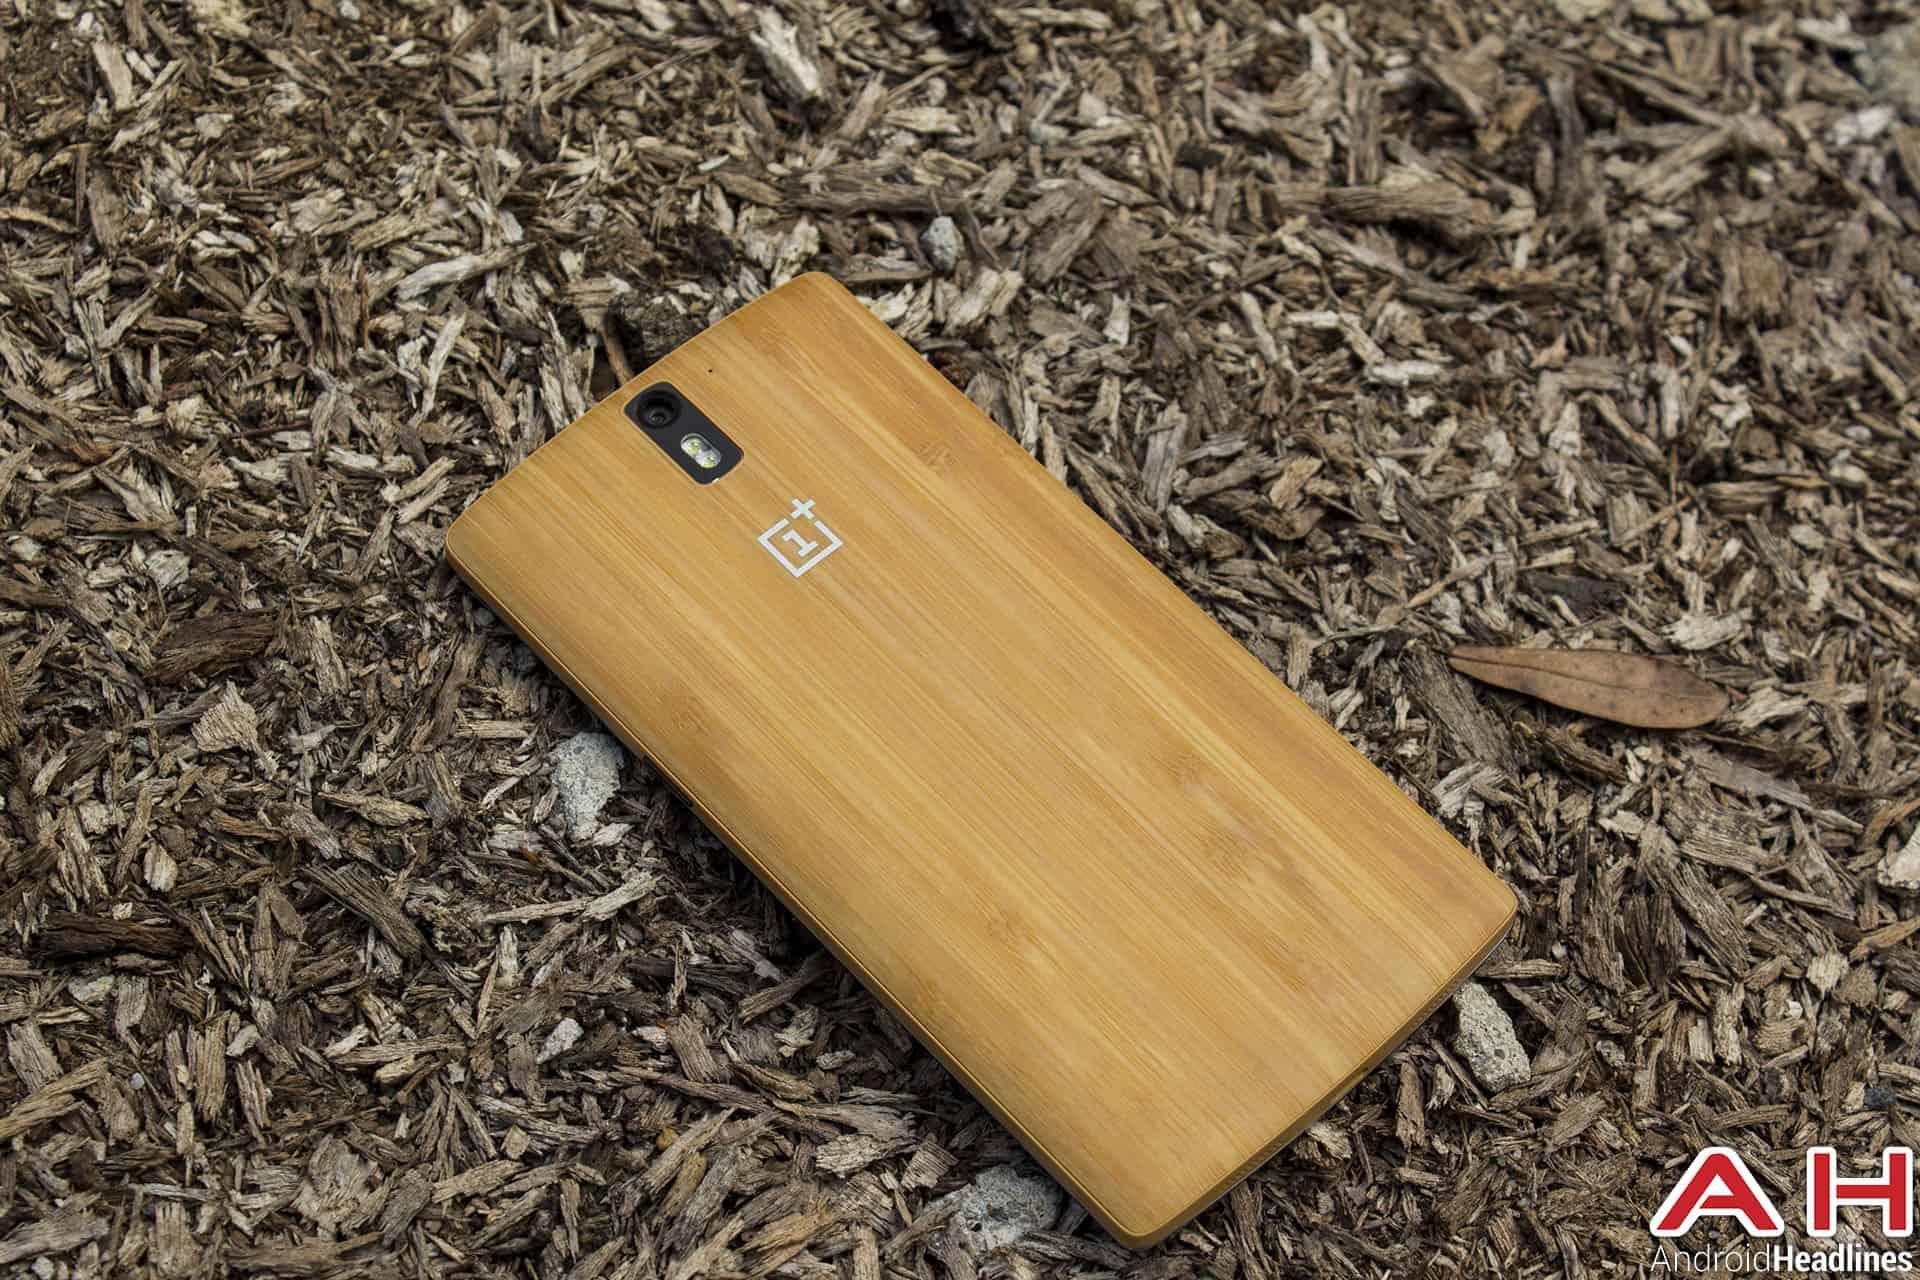 OnePlus-One-07